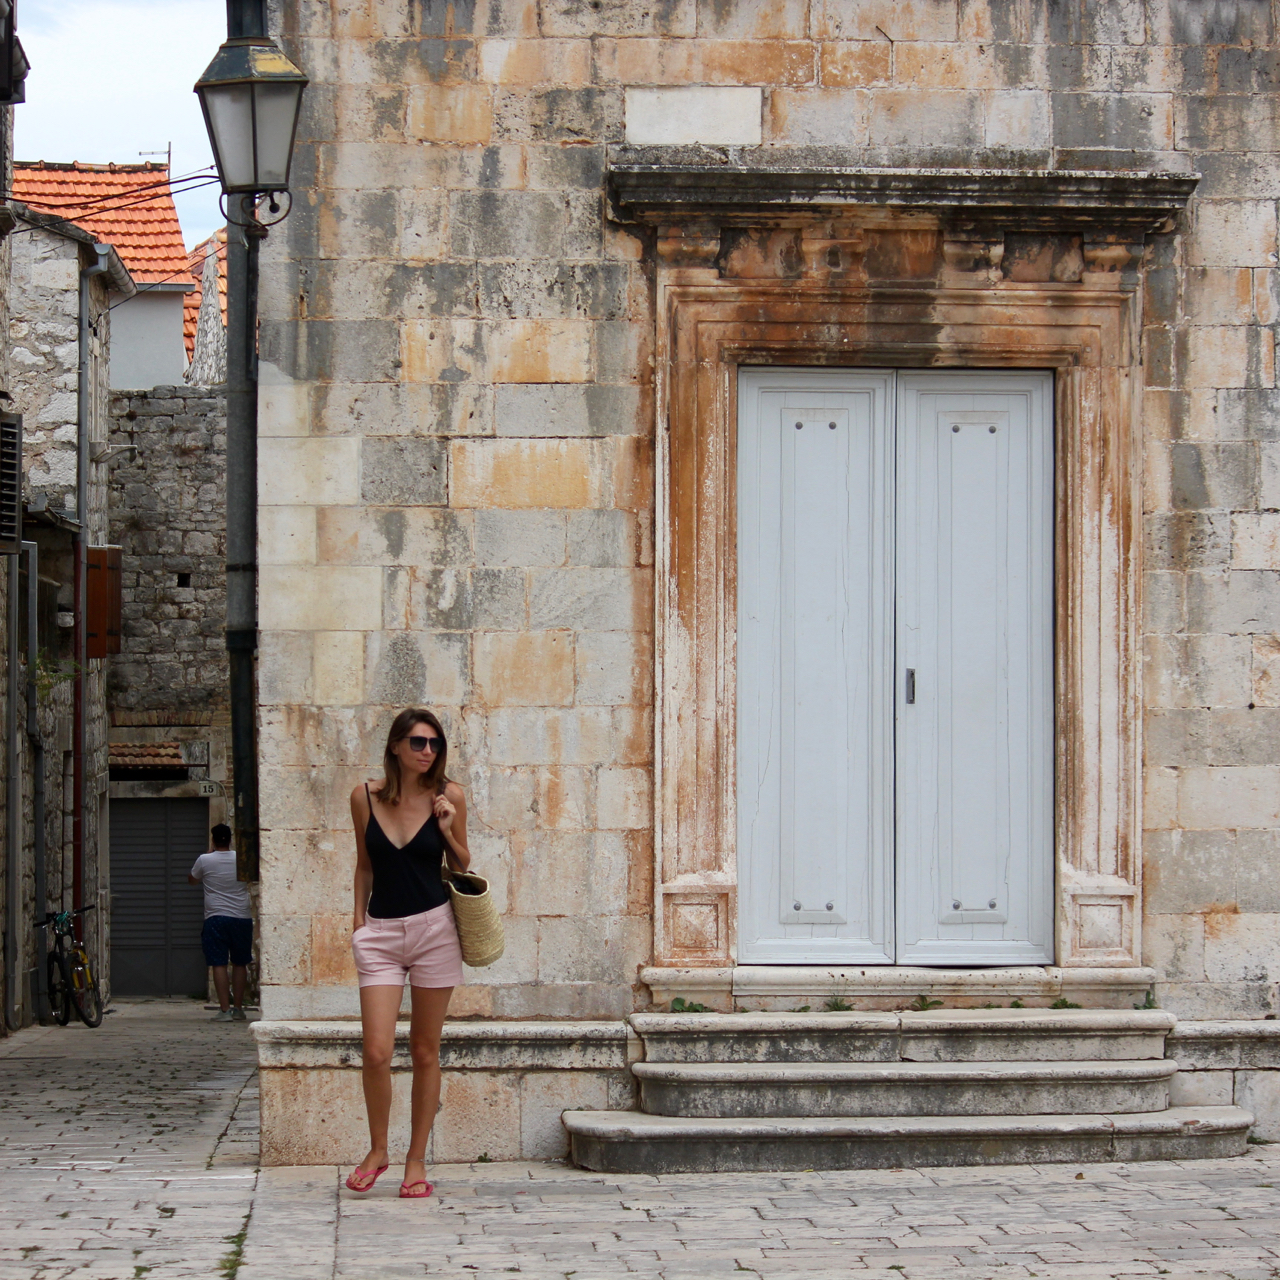 Stari Grad, Hvar, Croatia - 20